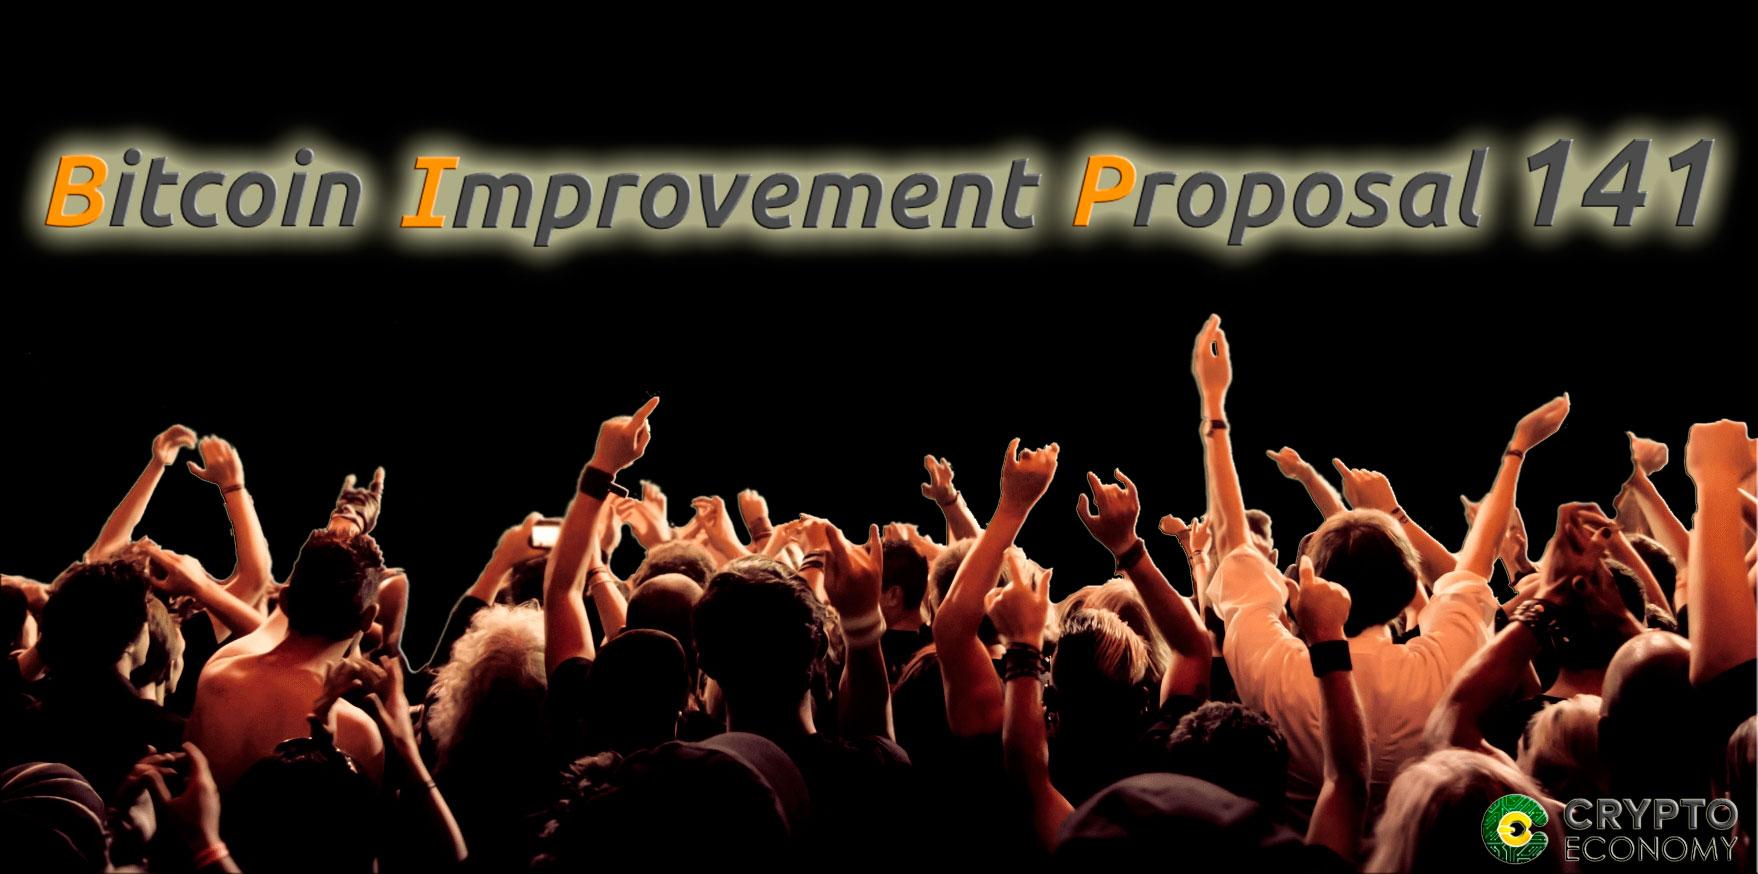 Bitcoin improvement Proposals